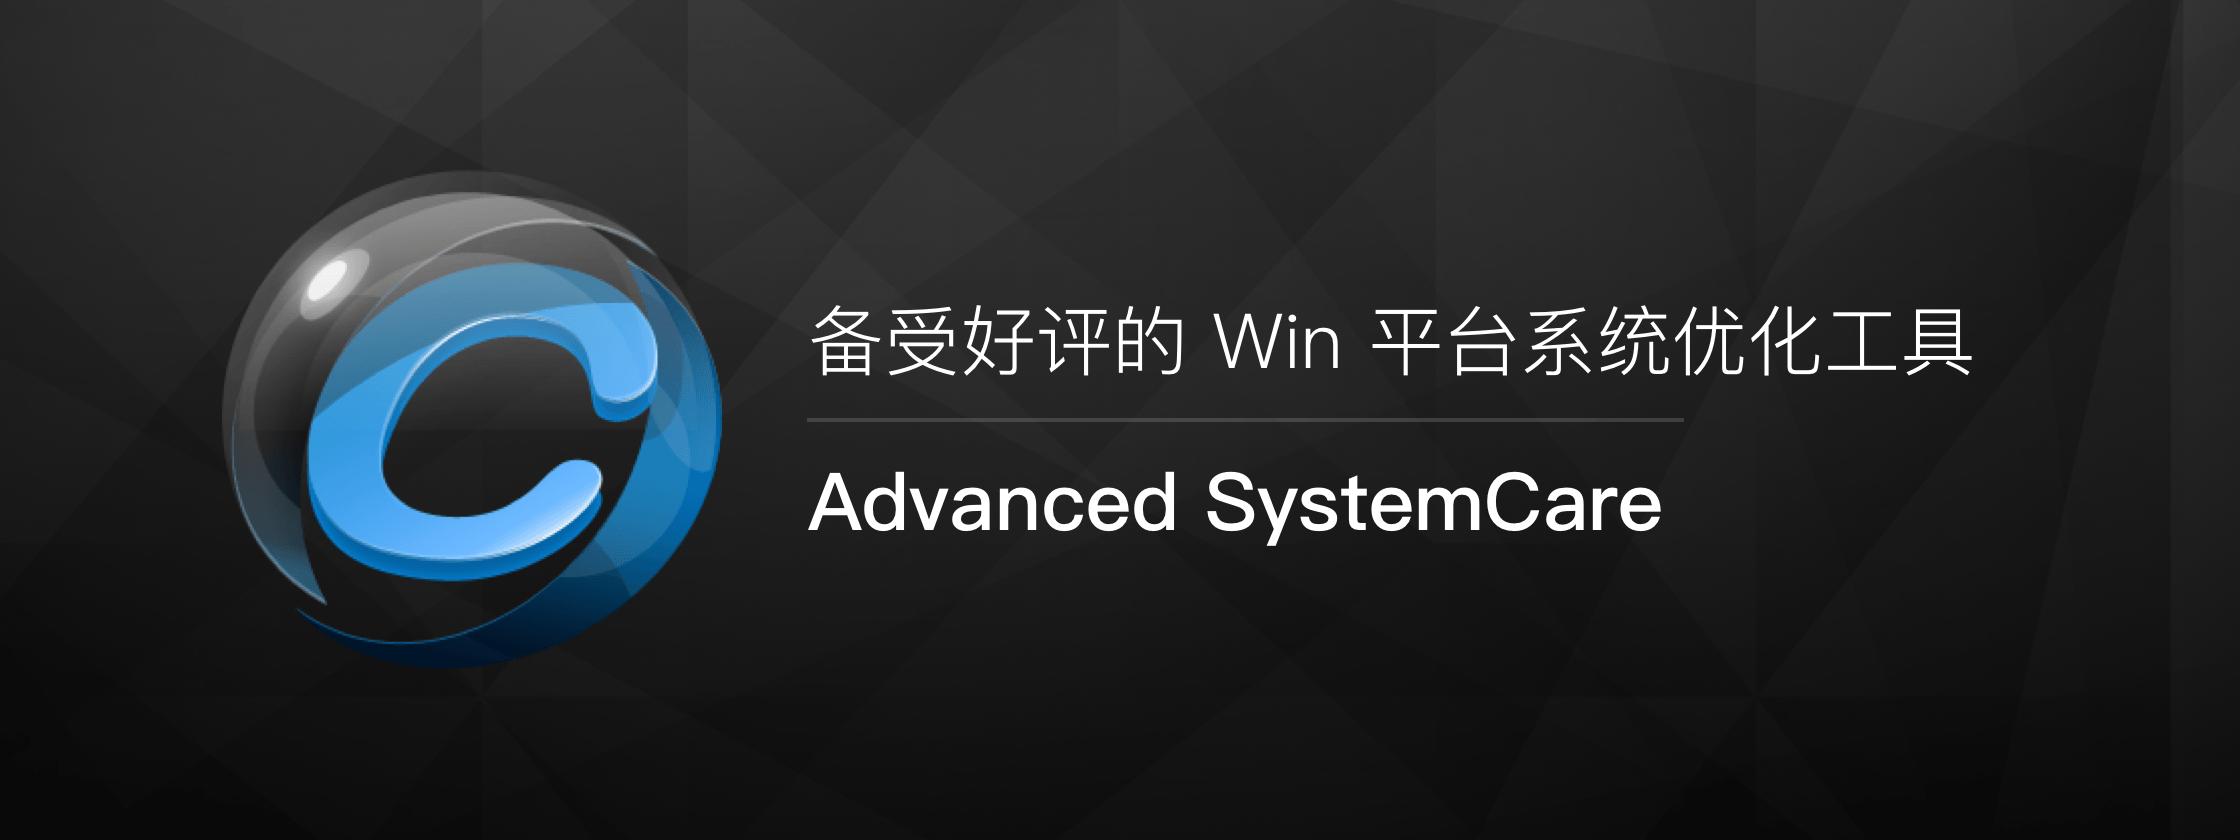 Advanced SystemCare Pro – 备受好评的 Win 平台系统优化工具